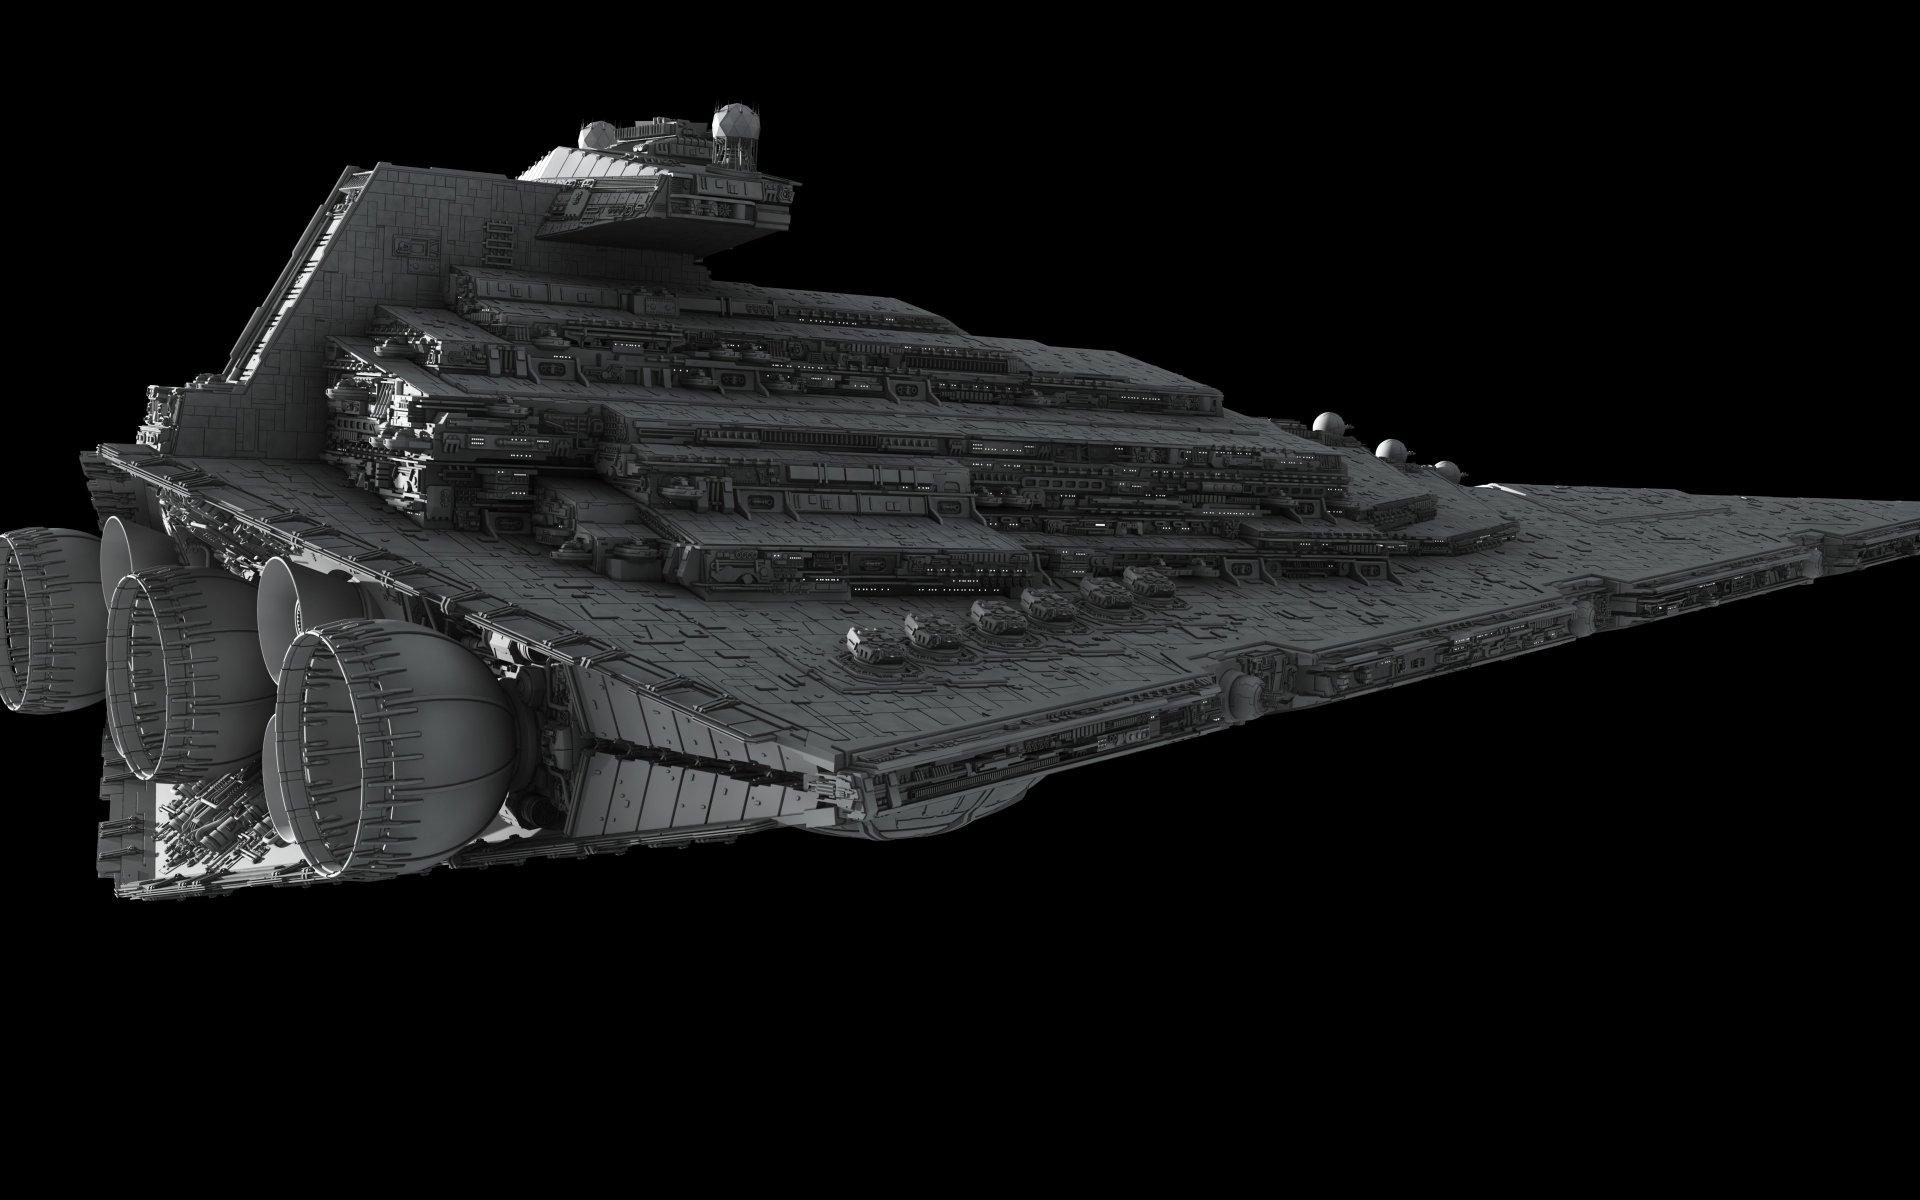 Star Wars Ultrawide Wallpaper: Star Wars 4k Ultra HD Wallpaper